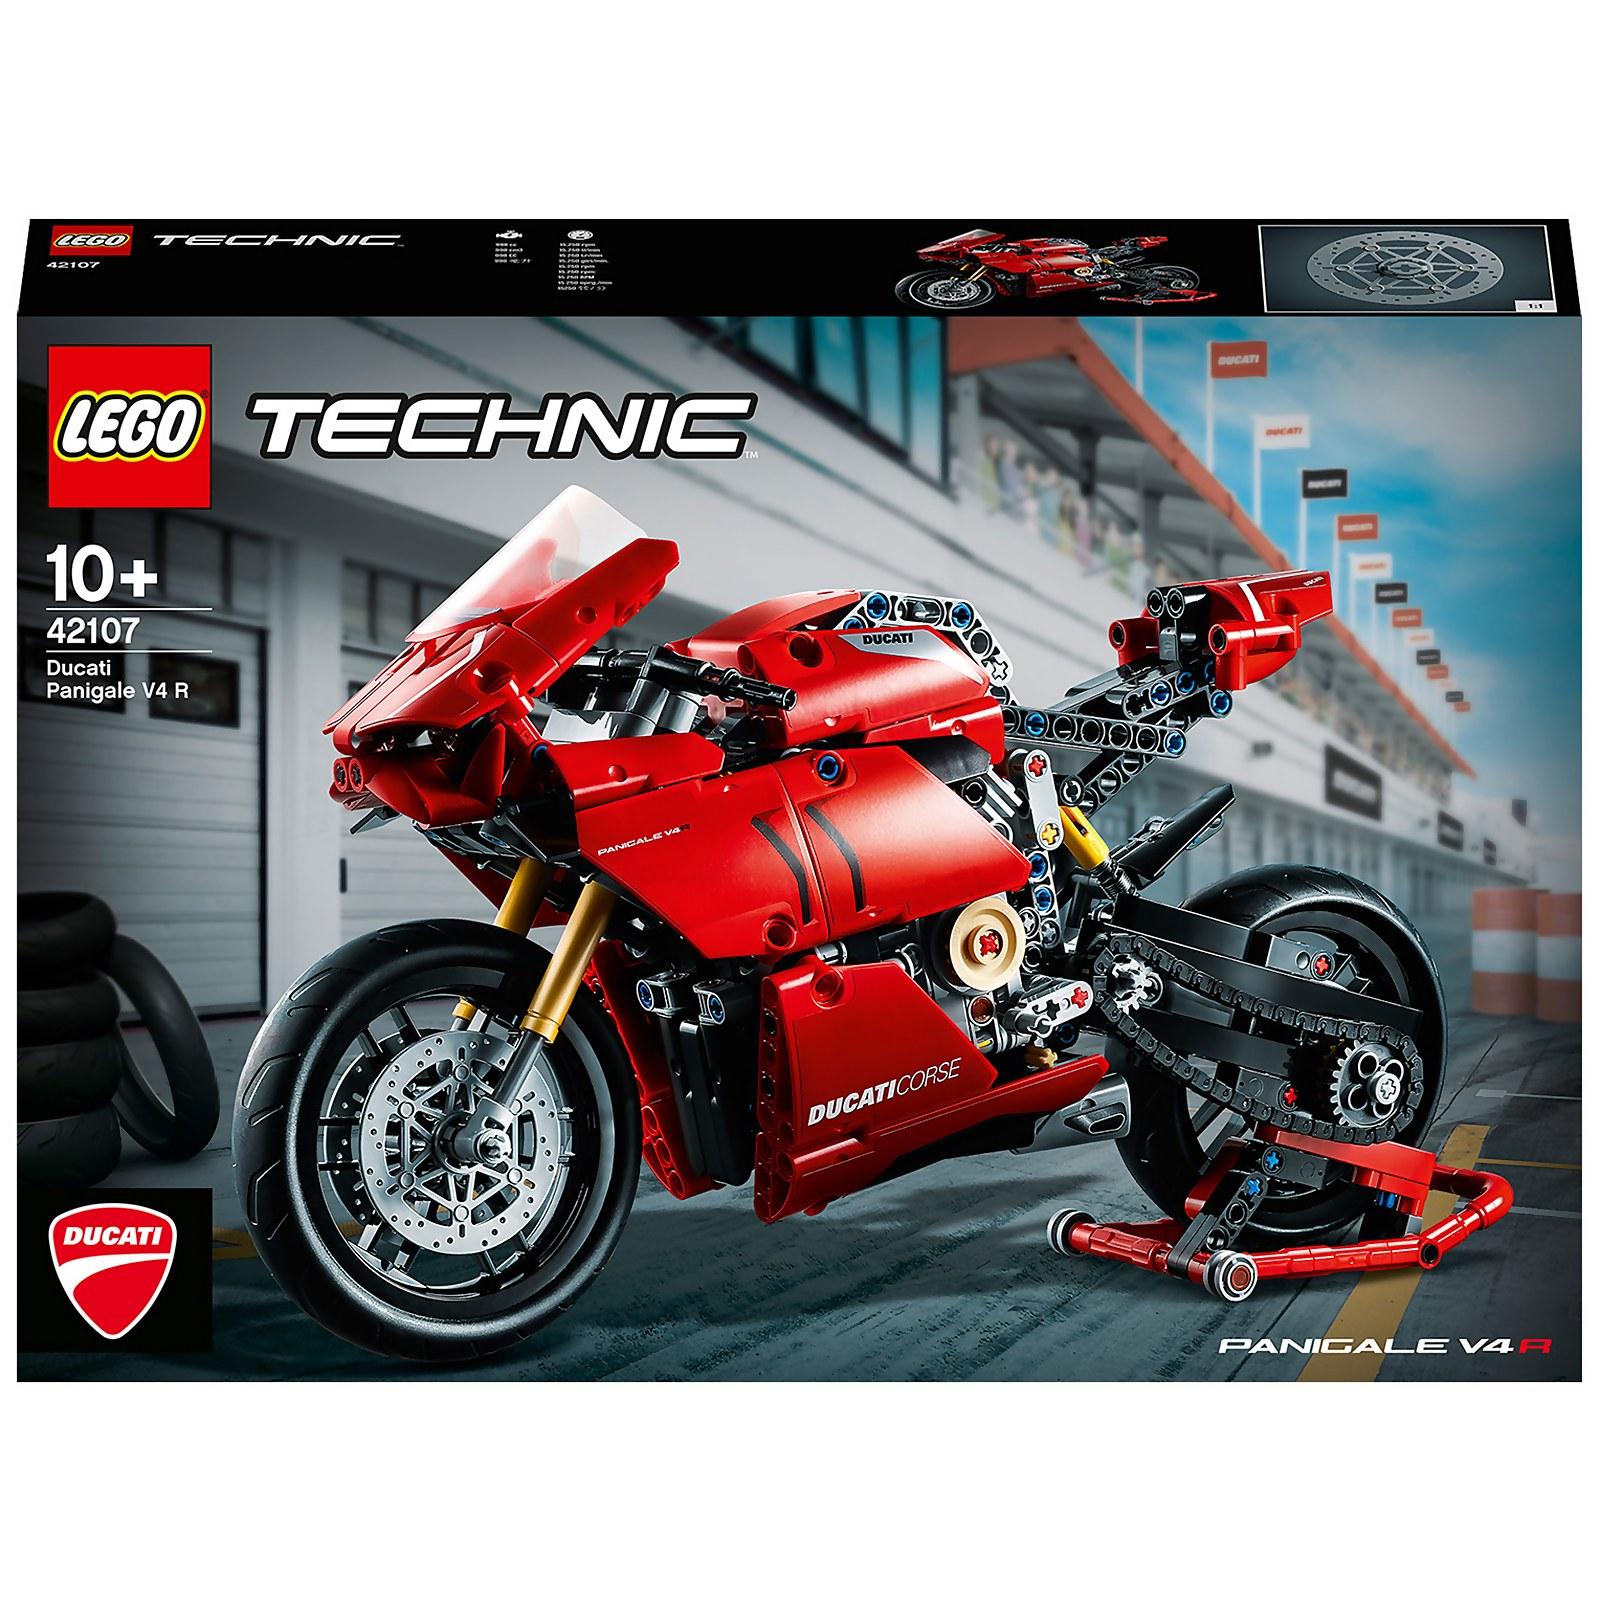 Image of 42107 LEGO® TECHNIC Ducati Panigale V4 R.